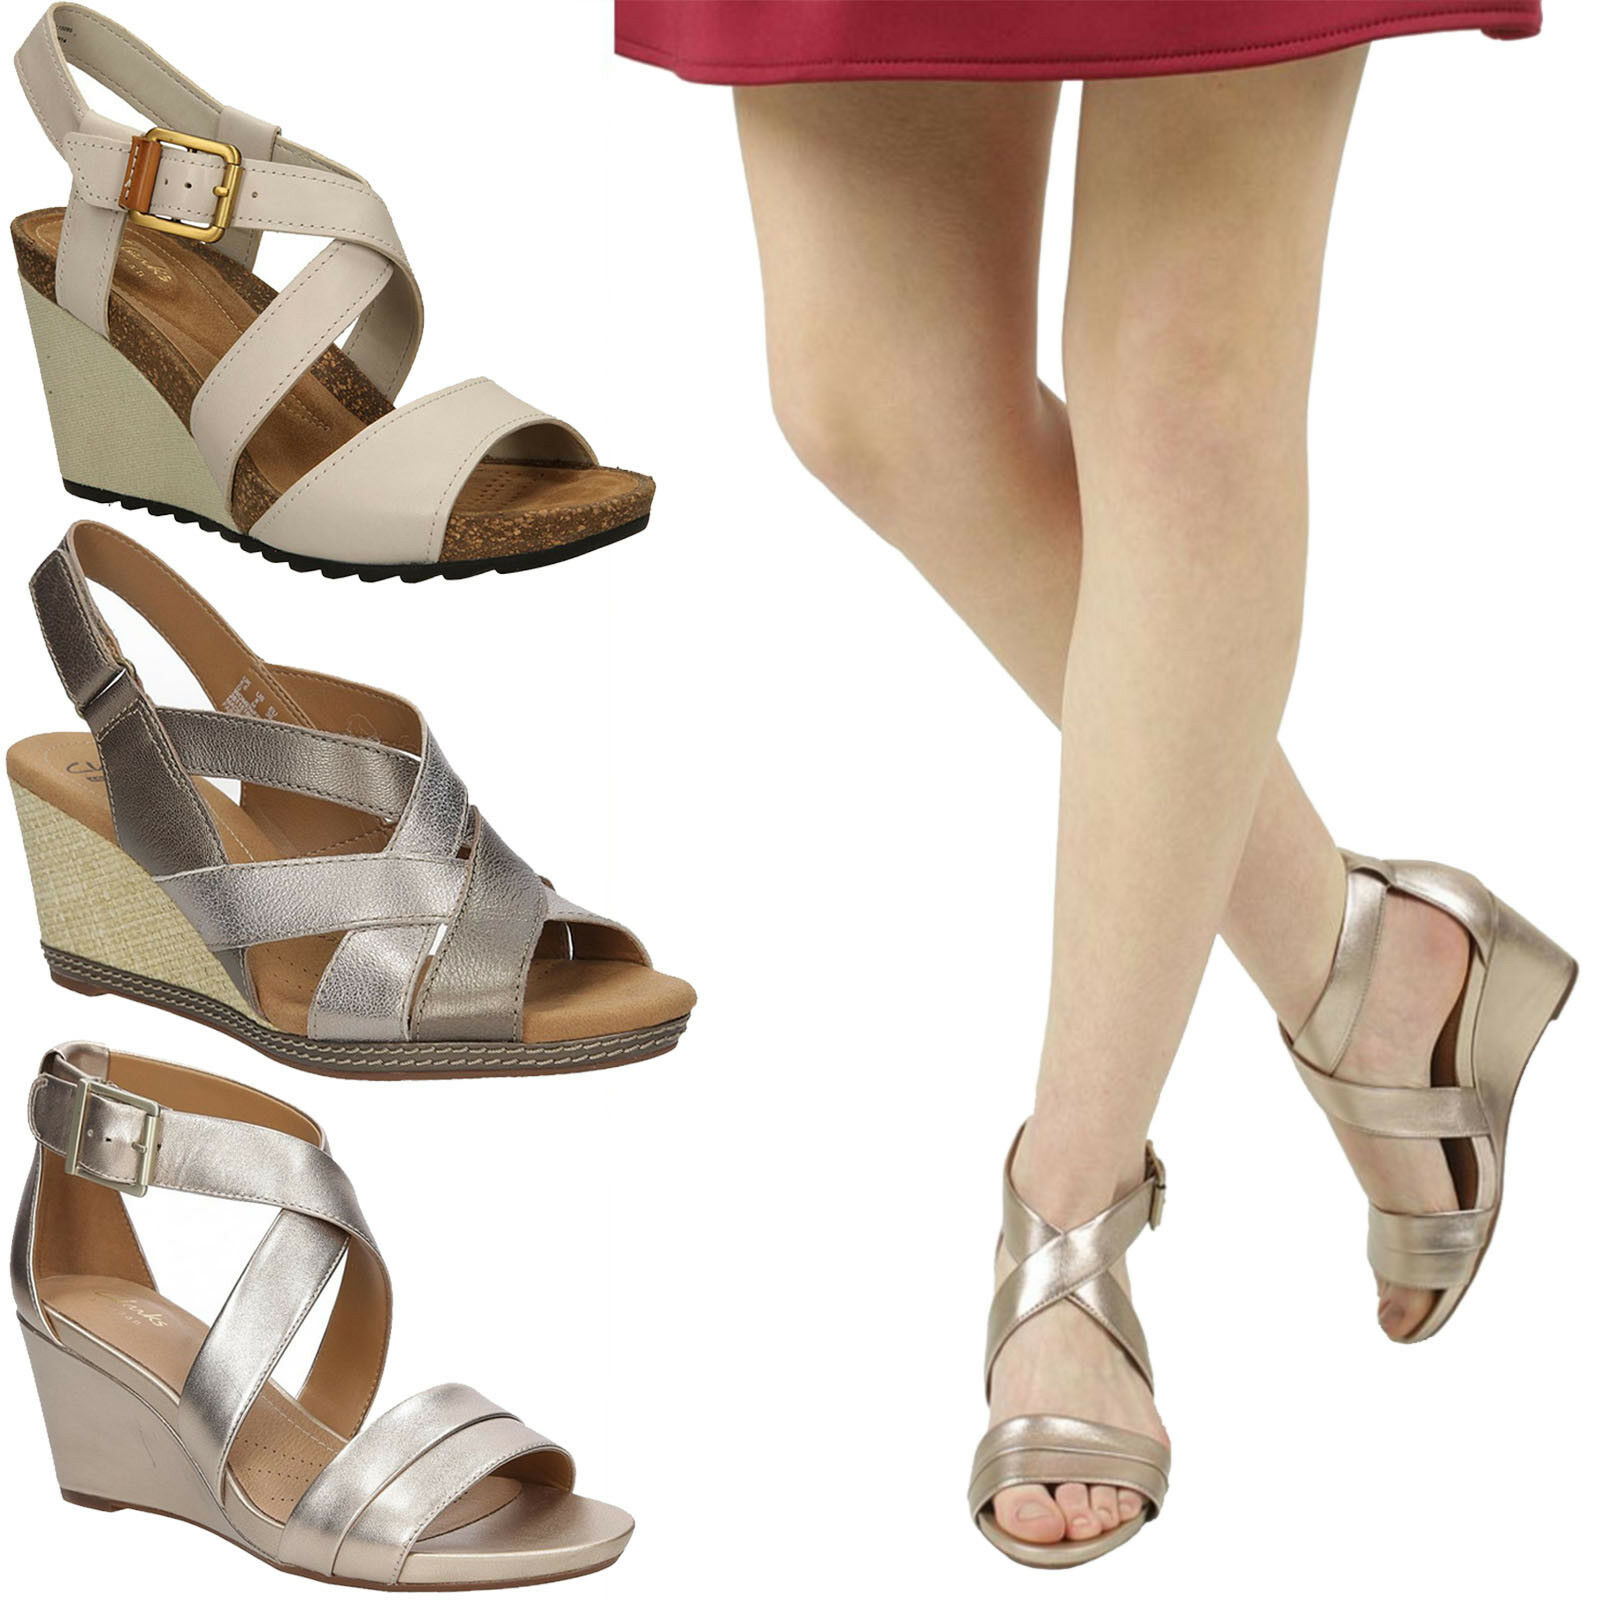 Damen Sandaletten Clarks Acina NEUport 26125768 Leder Keilabsatz Gr. 37-40 SALE